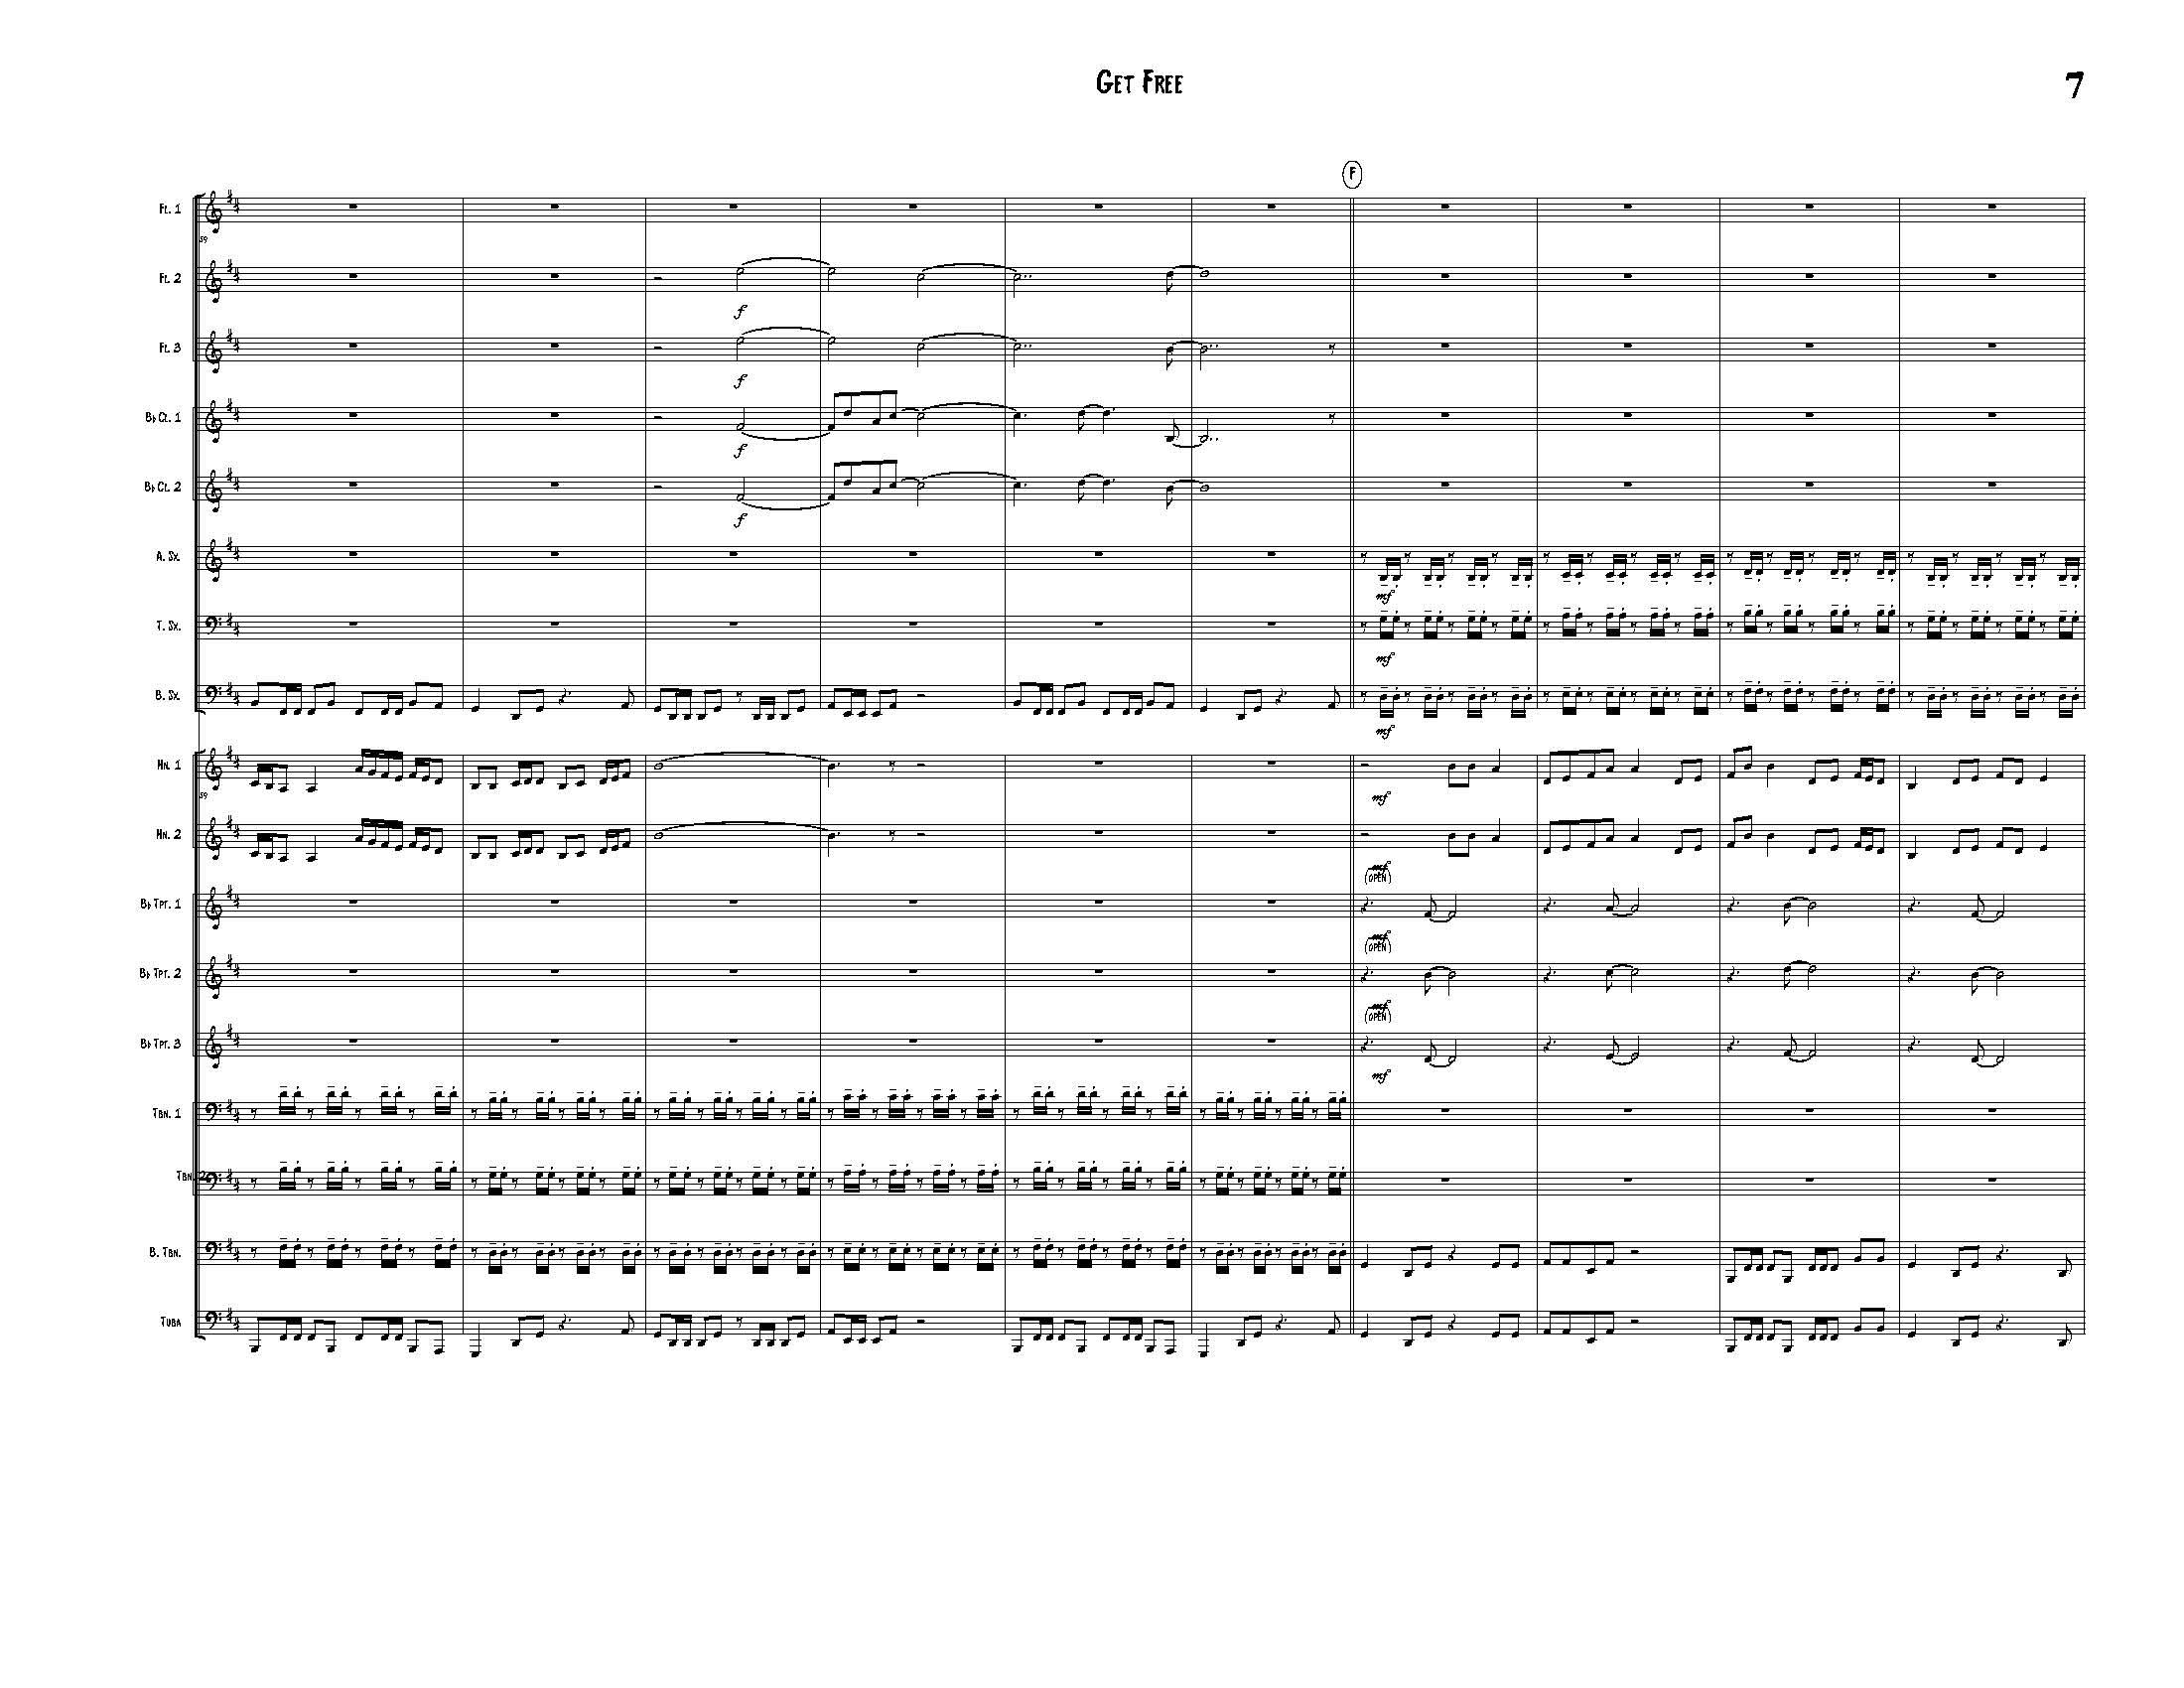 Get Free BKLYN 1834 Score_Page_07.jpg